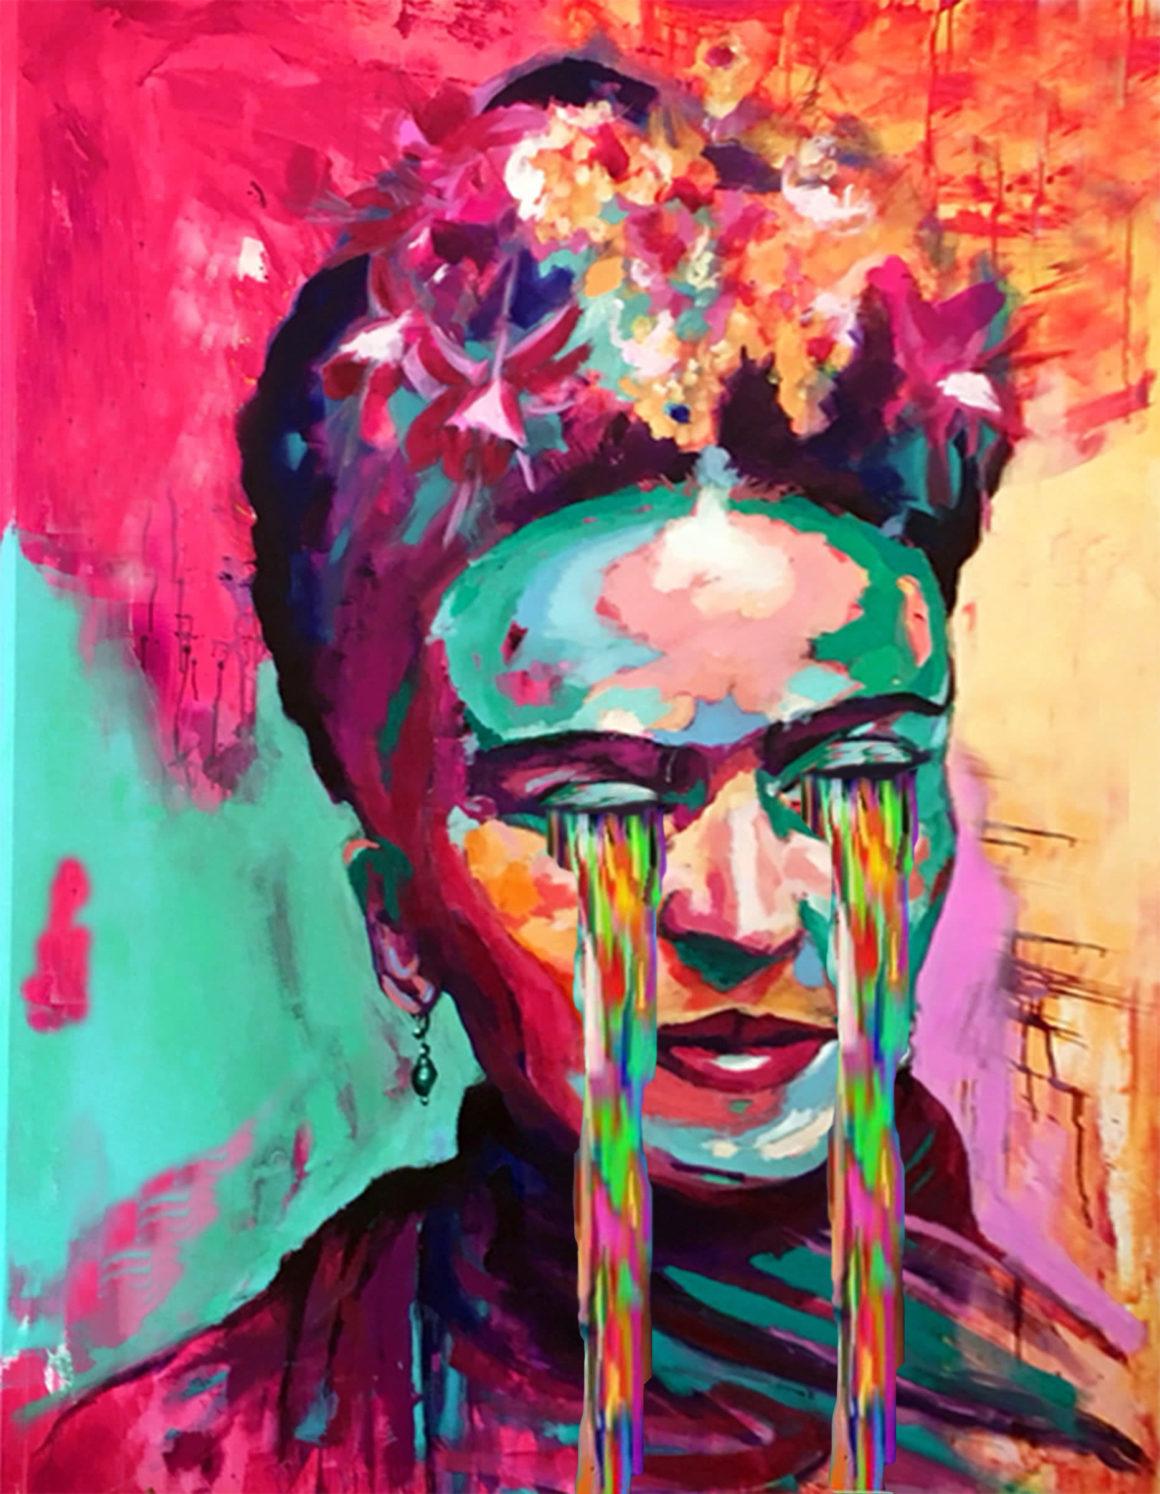 Cyring Frida Kahlo